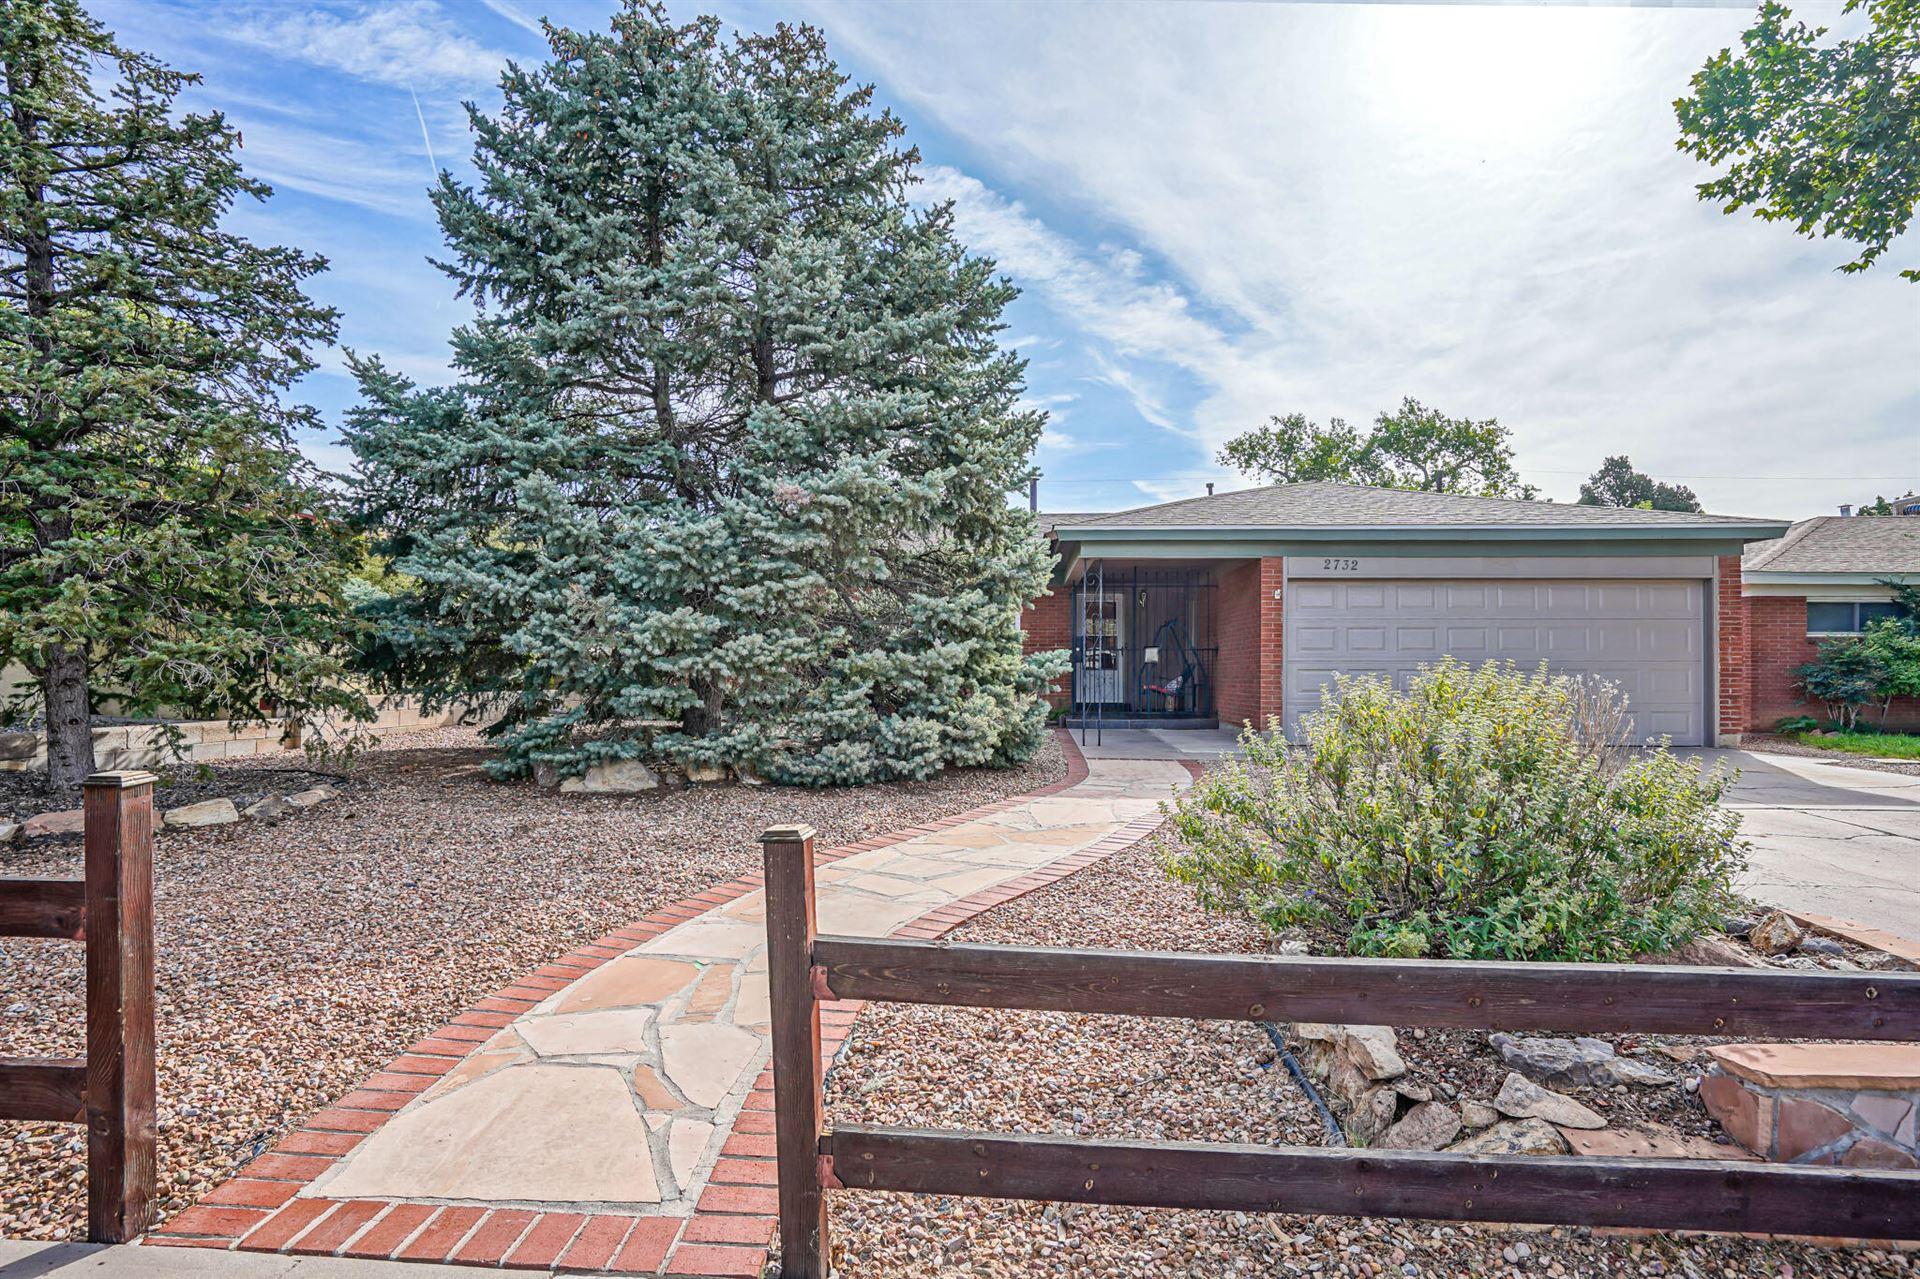 Photo for 2732 RHODE ISLAND Street NE, Albuquerque, NM 87110 (MLS # 1001743)